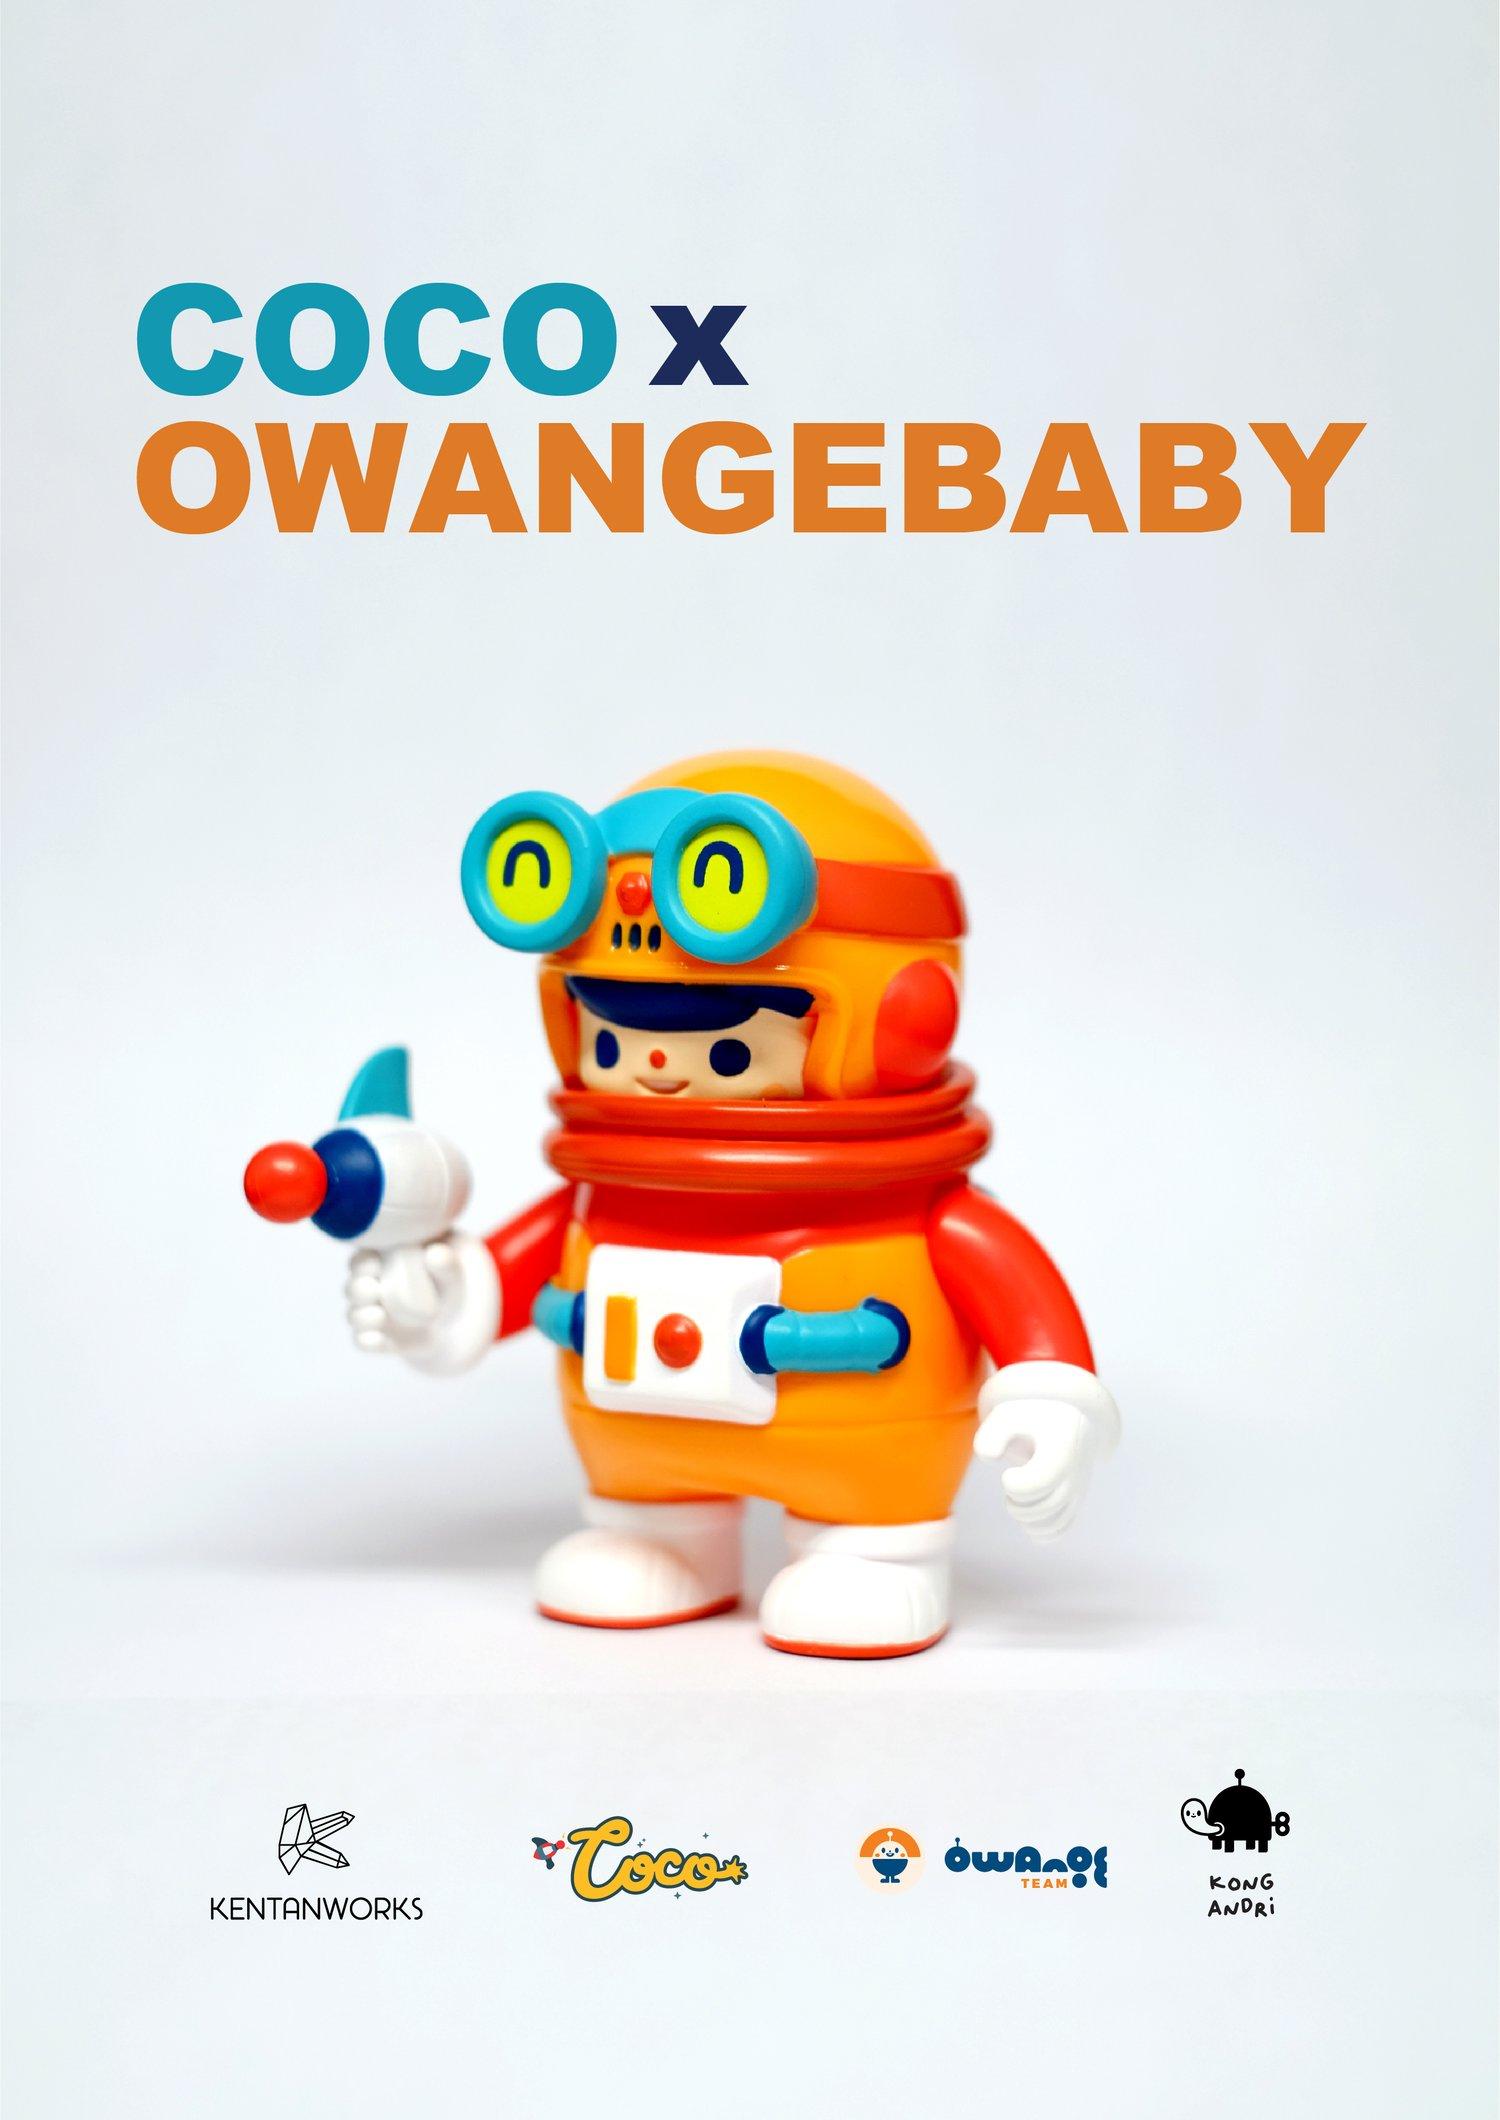 Image of Owange Baby